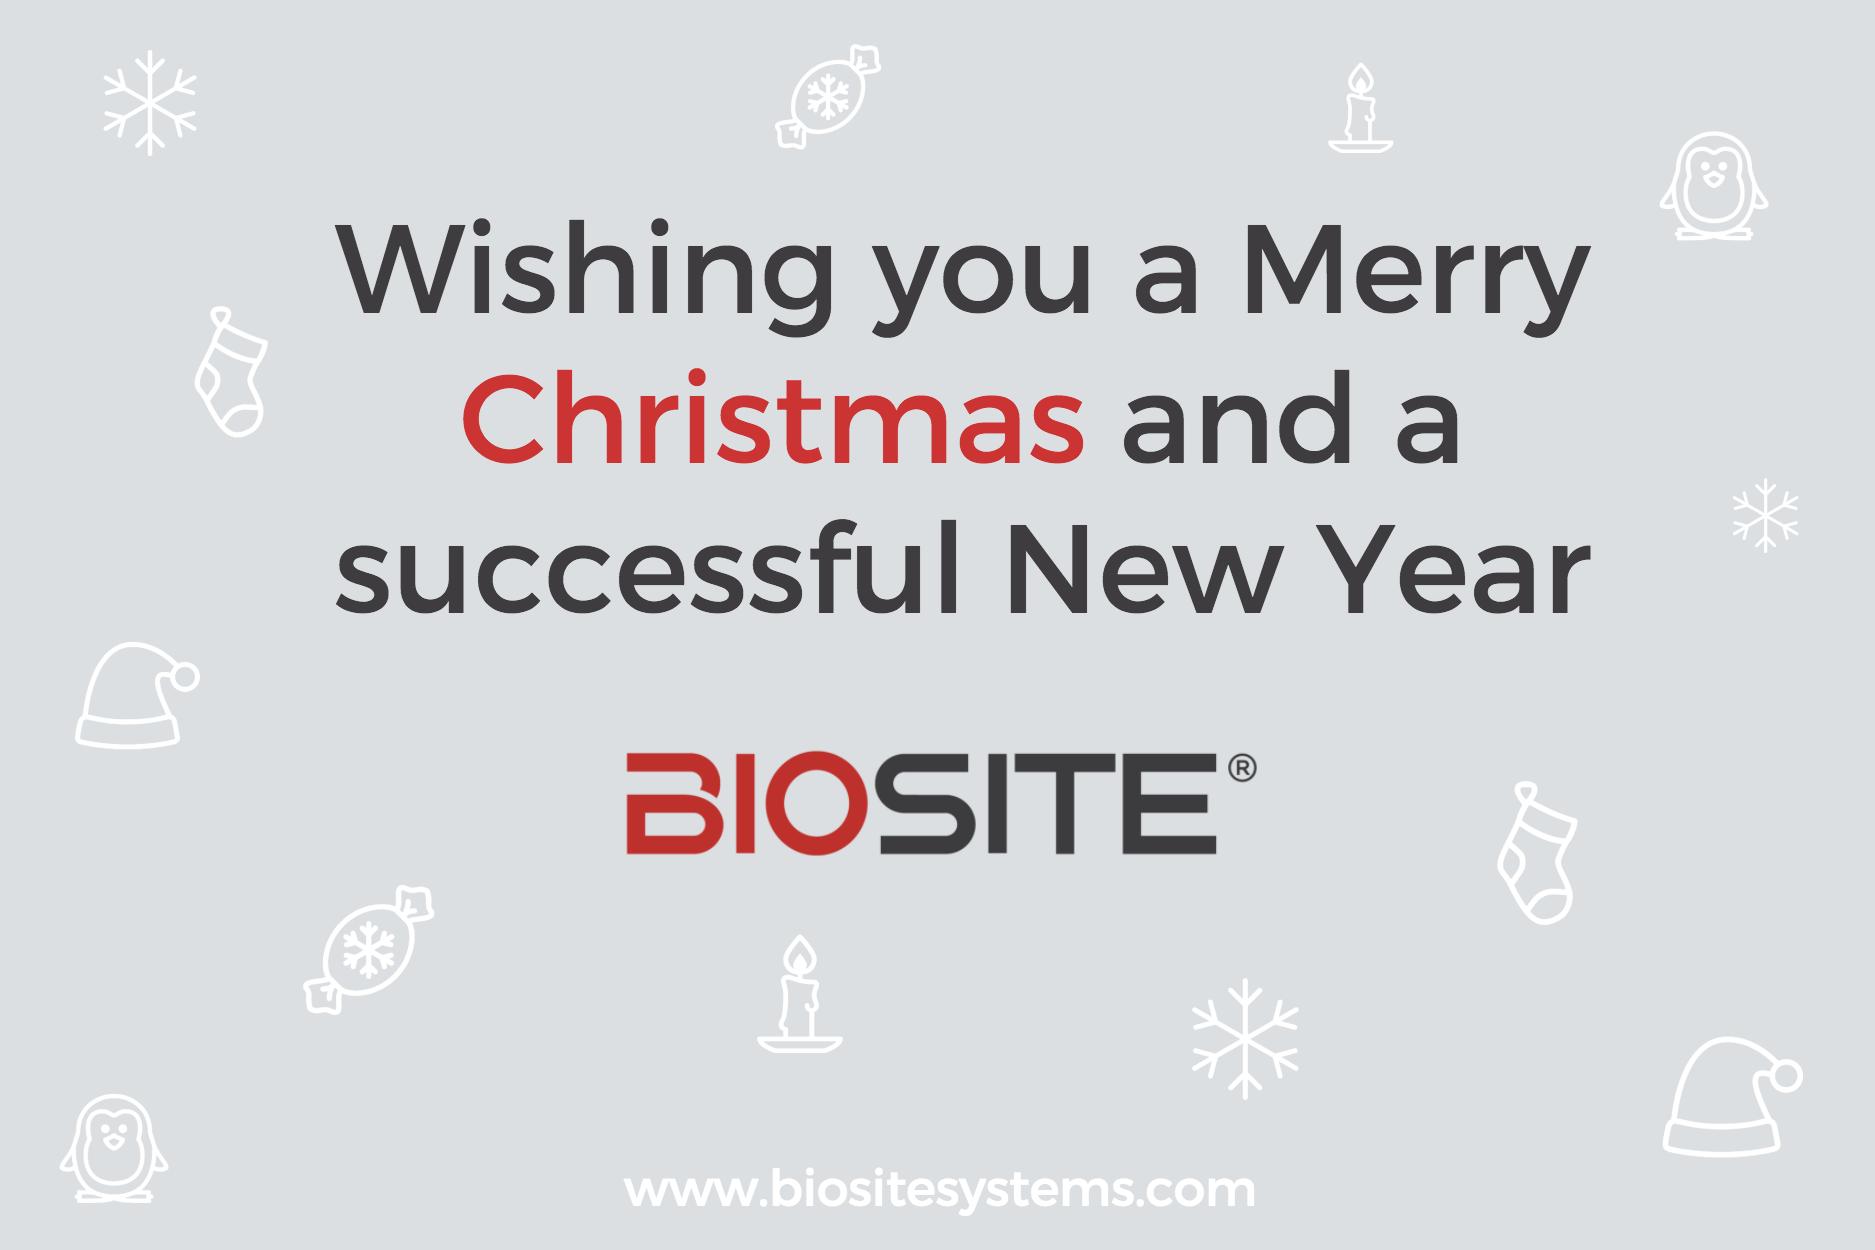 biosite-christmas